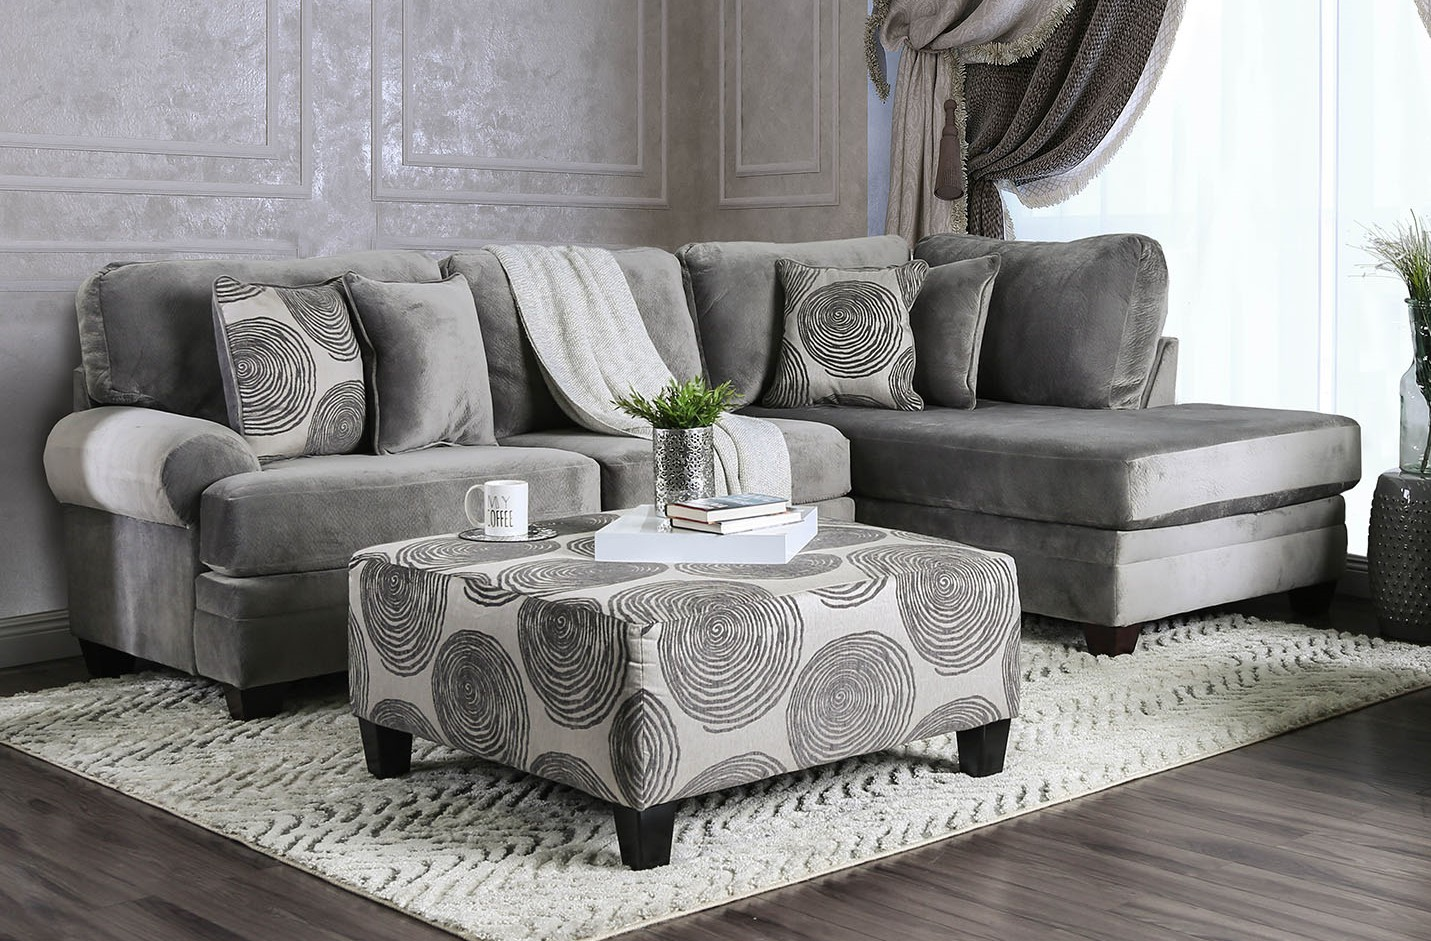 SM5143GY 2 pc Bonaventura gray plush microfiber sectional sofa